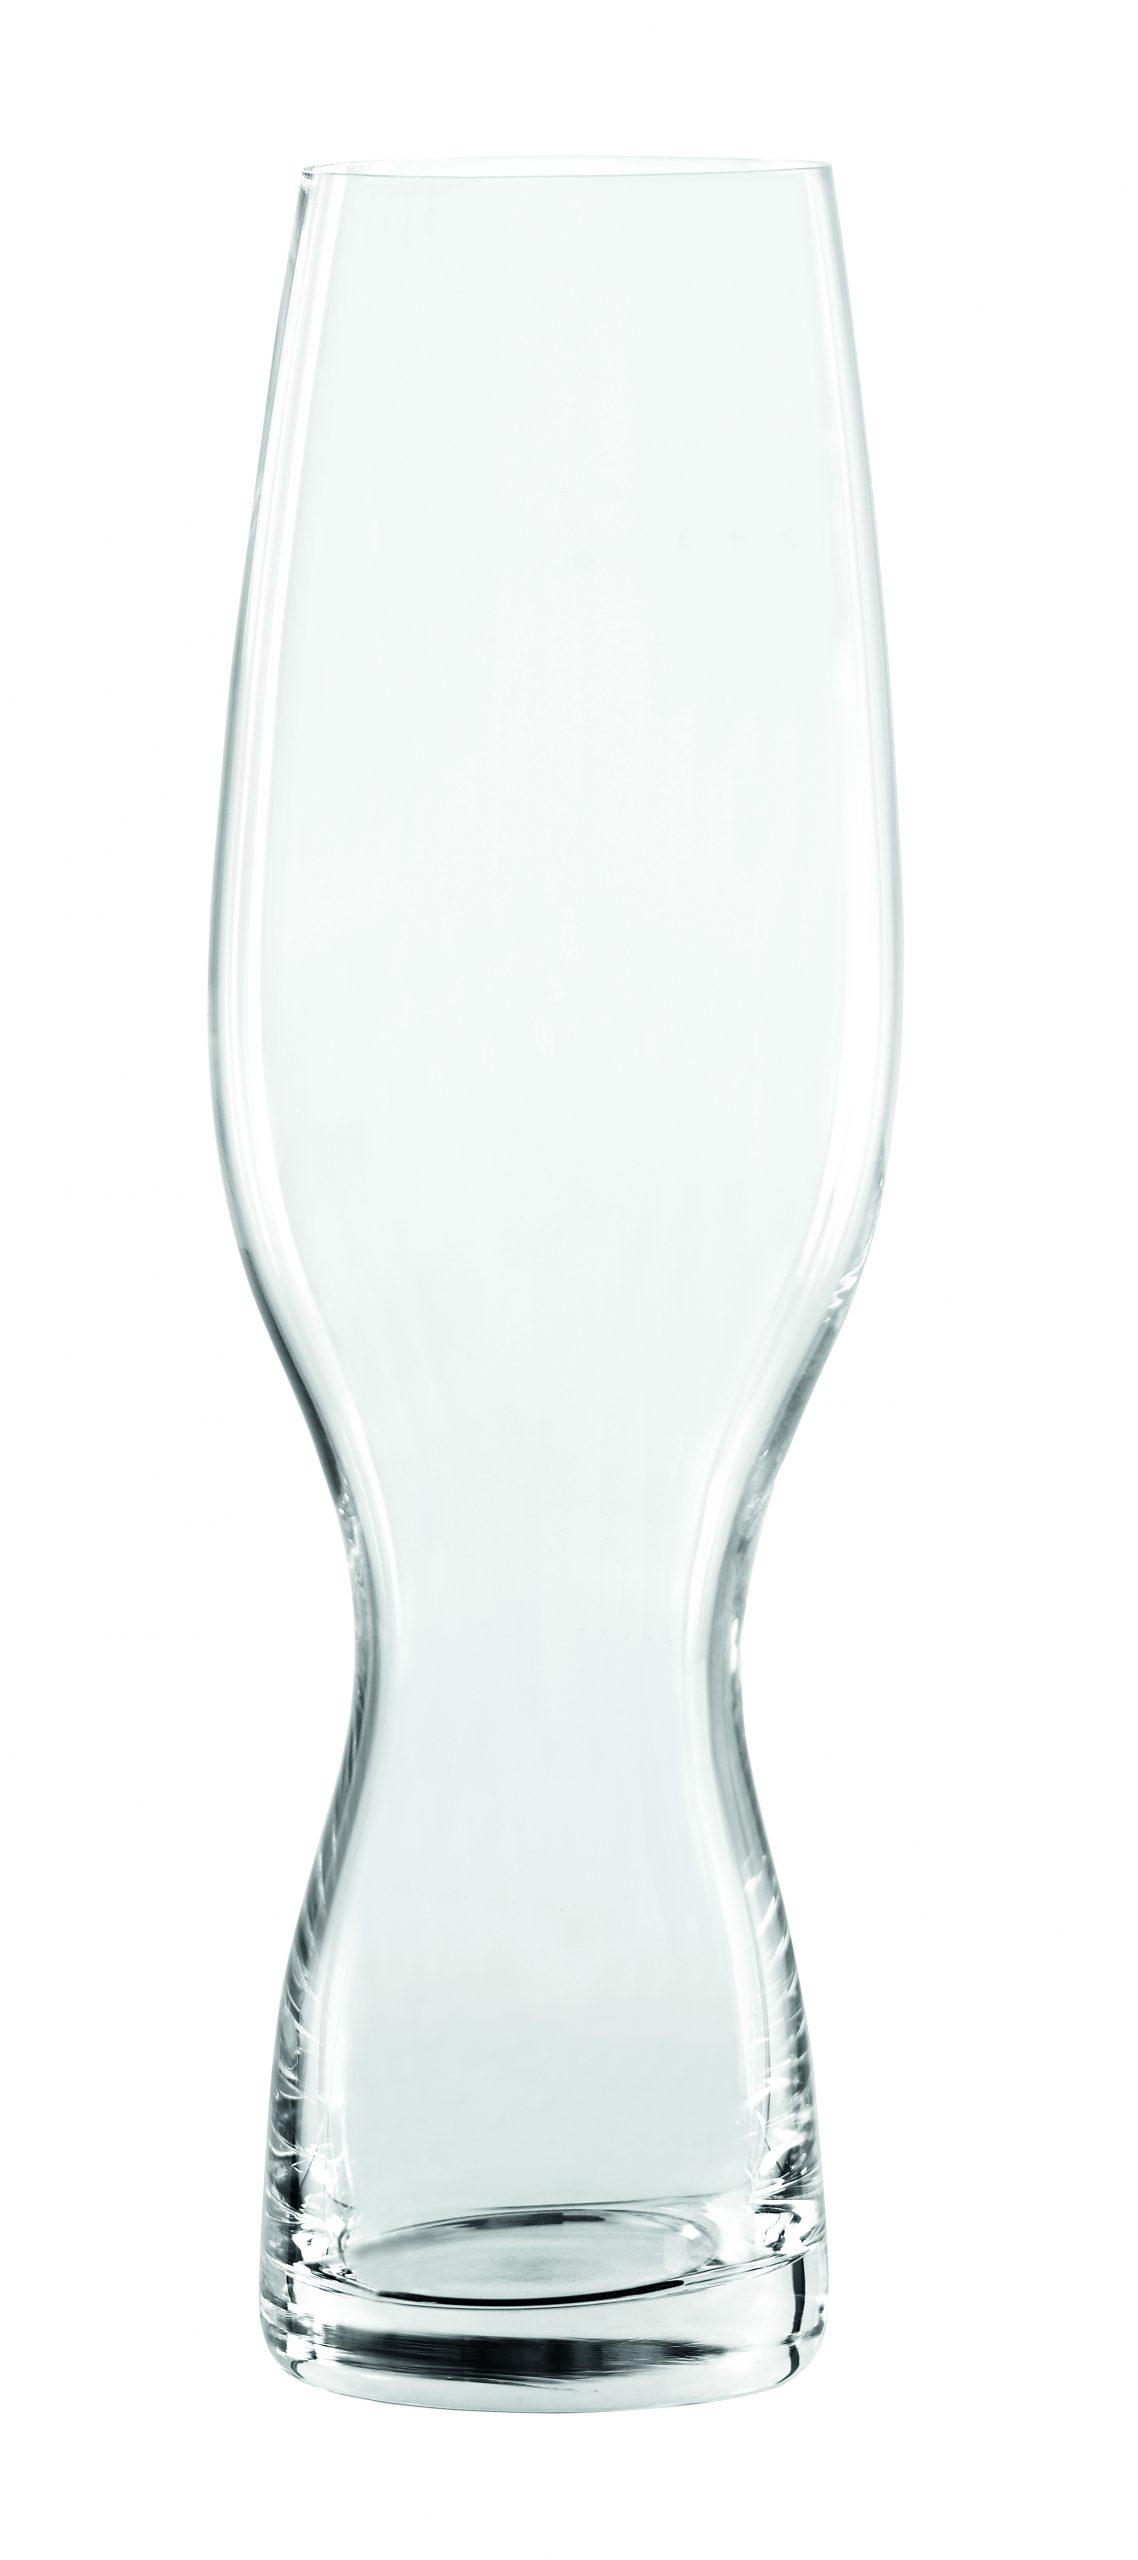 Spiegelau Pilsner Beer Glass, 4 Piece-0